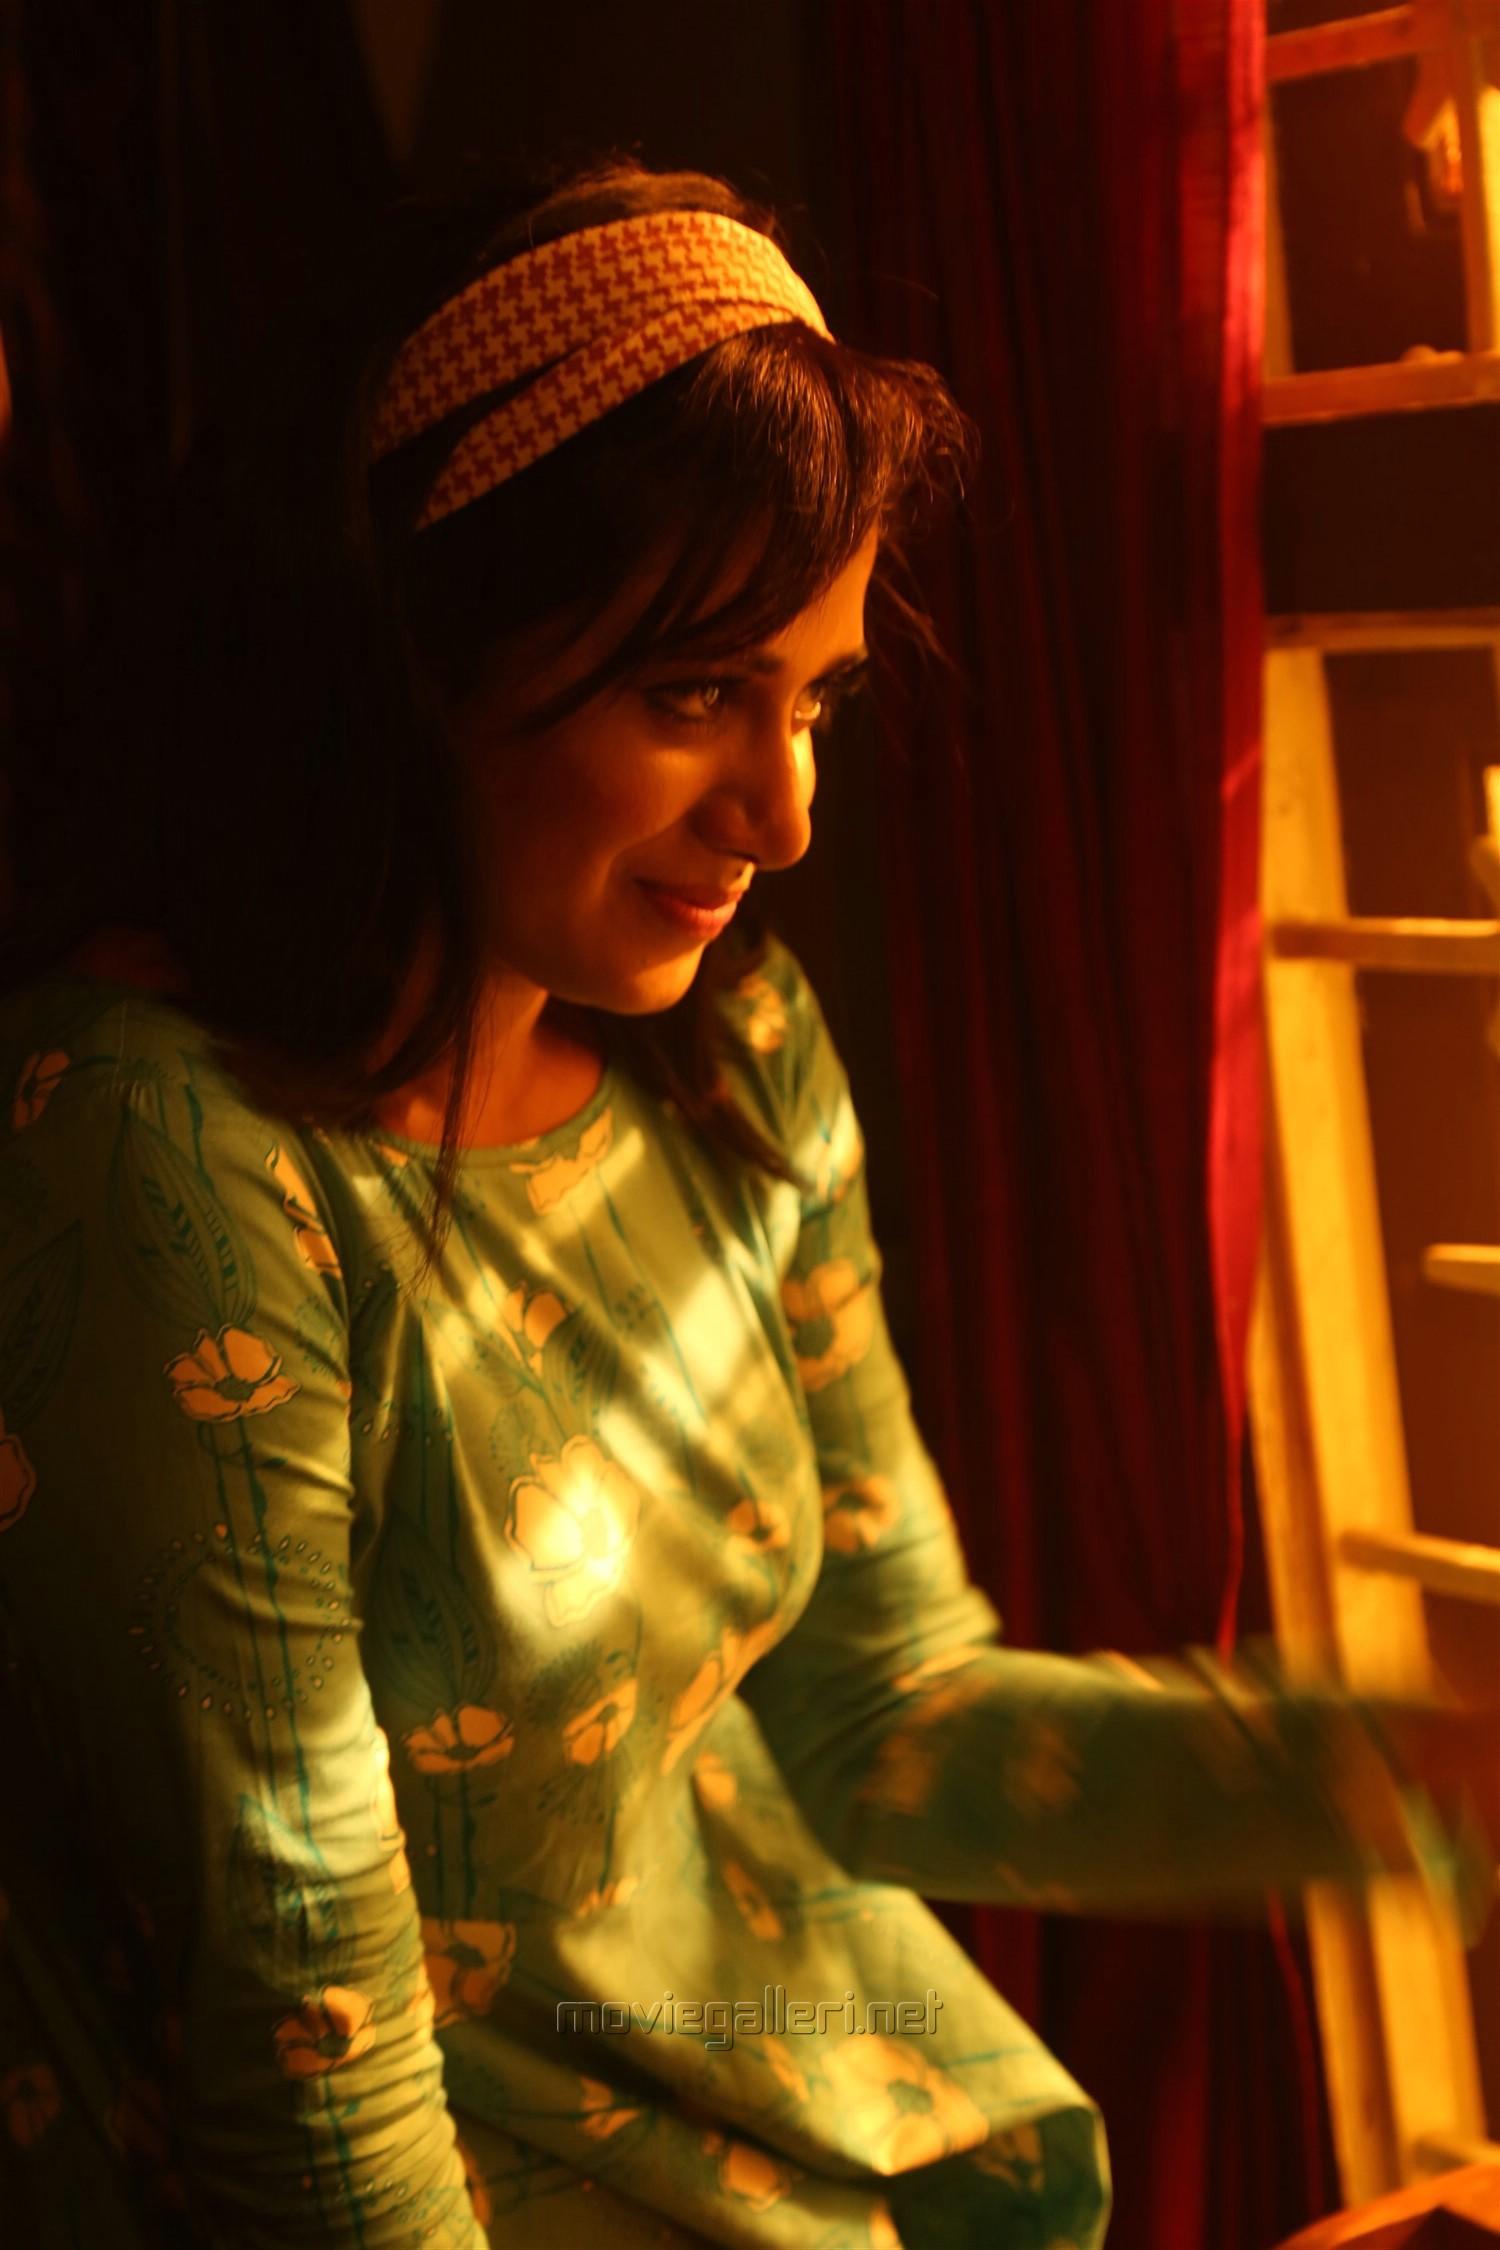 Ispade Rajavum Idhaya Raniyum Actress Shilpa Manjunath HD Images